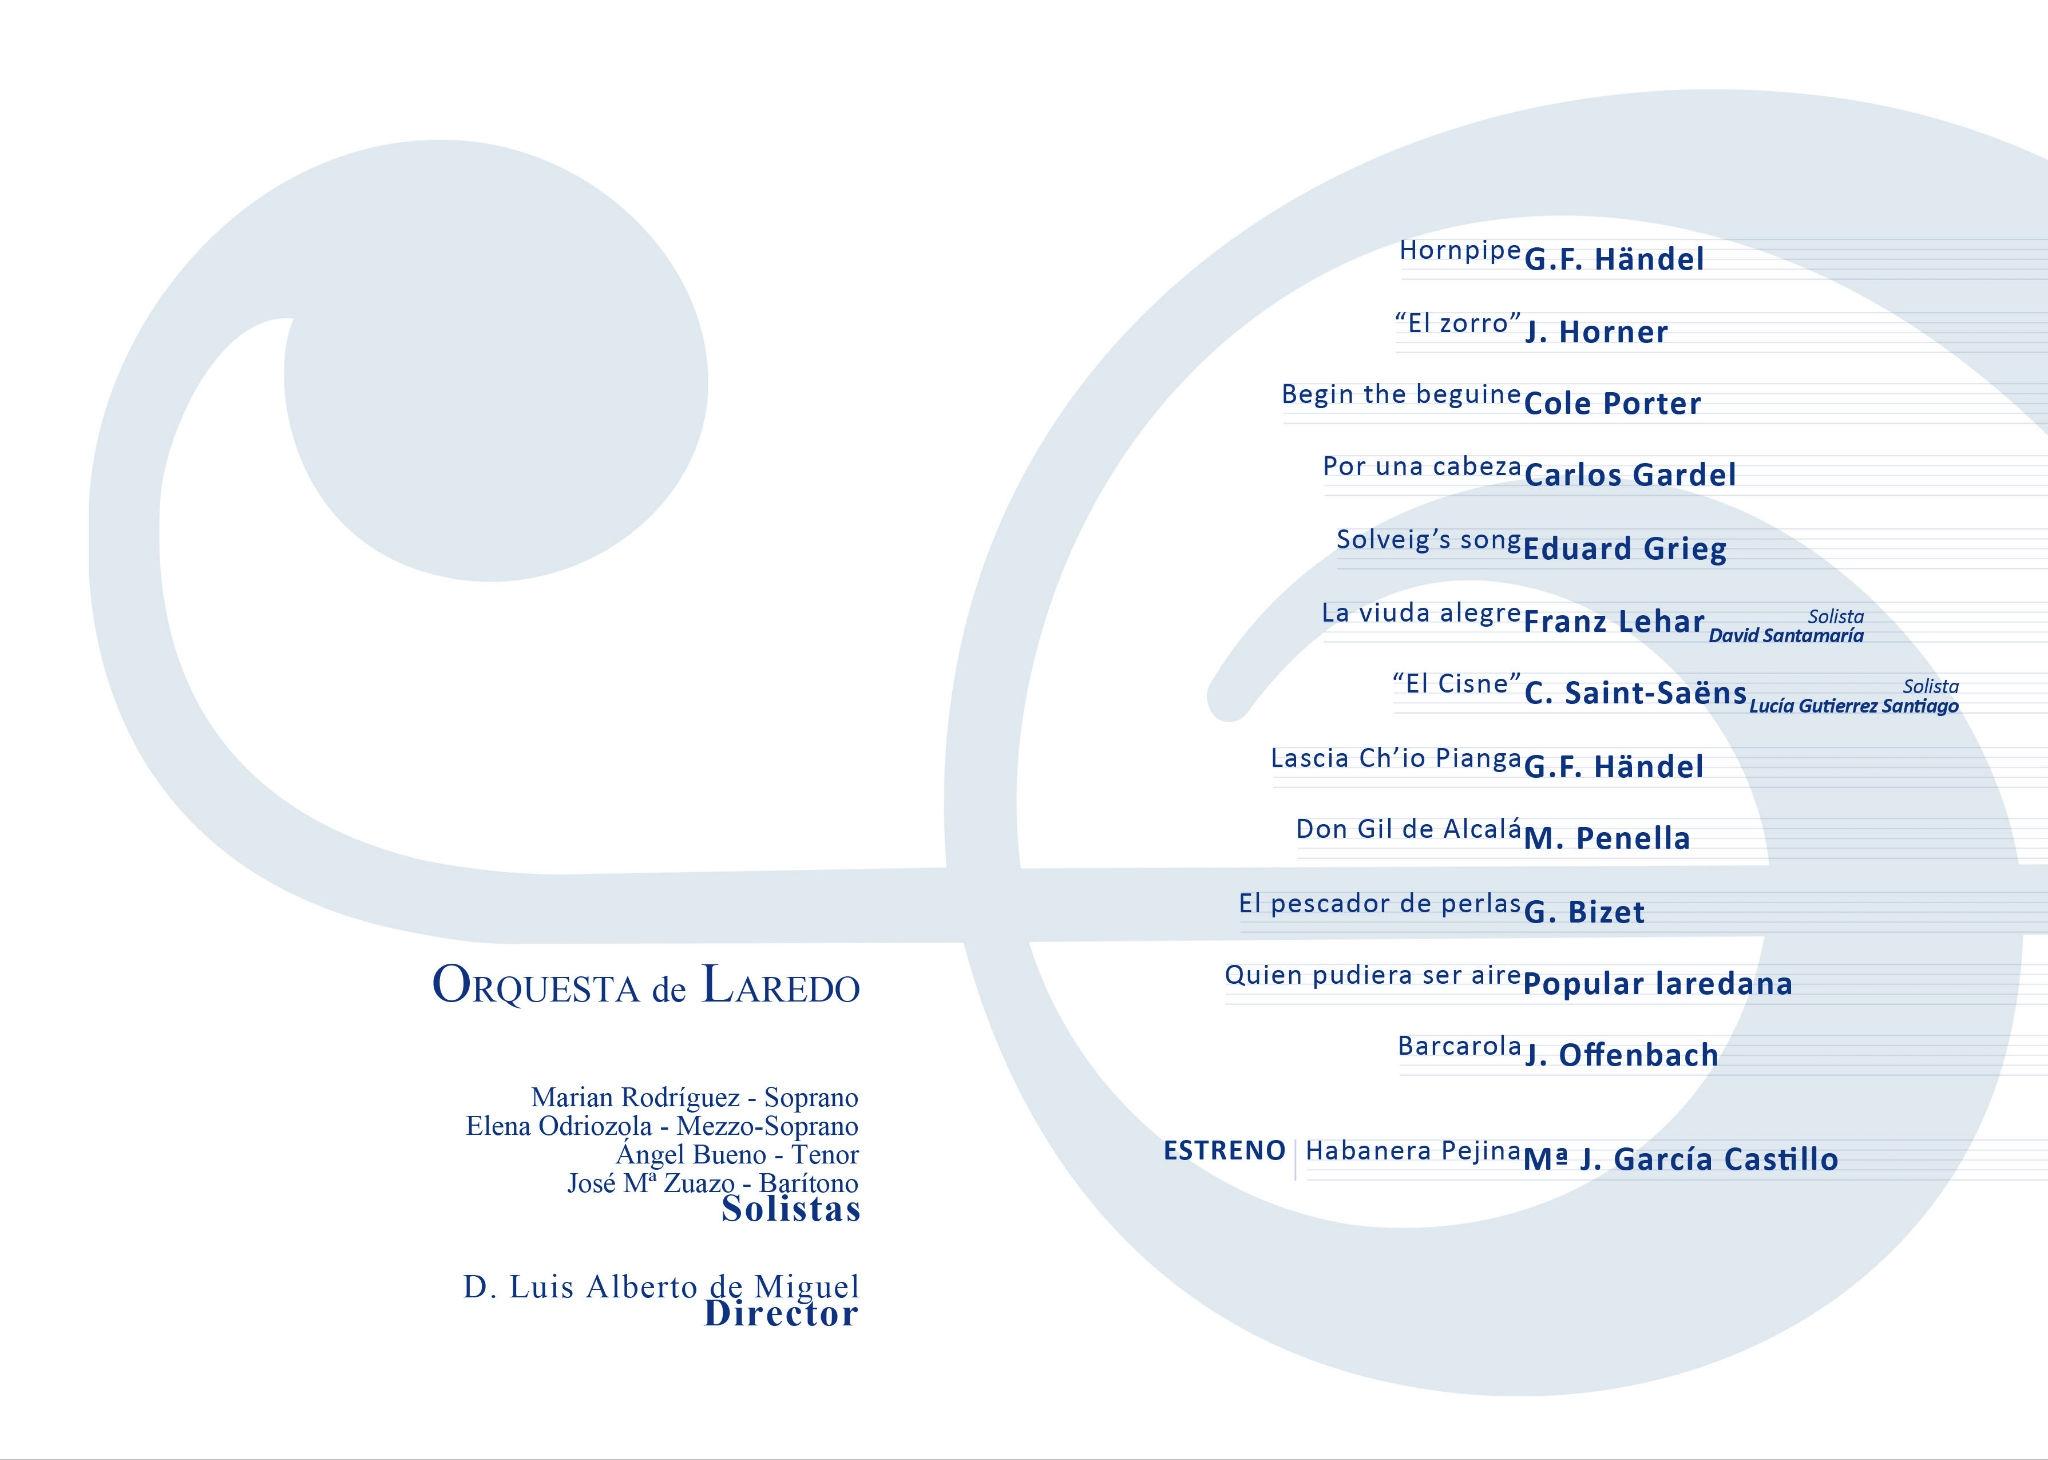 2012 Estreno Habanera Pejina